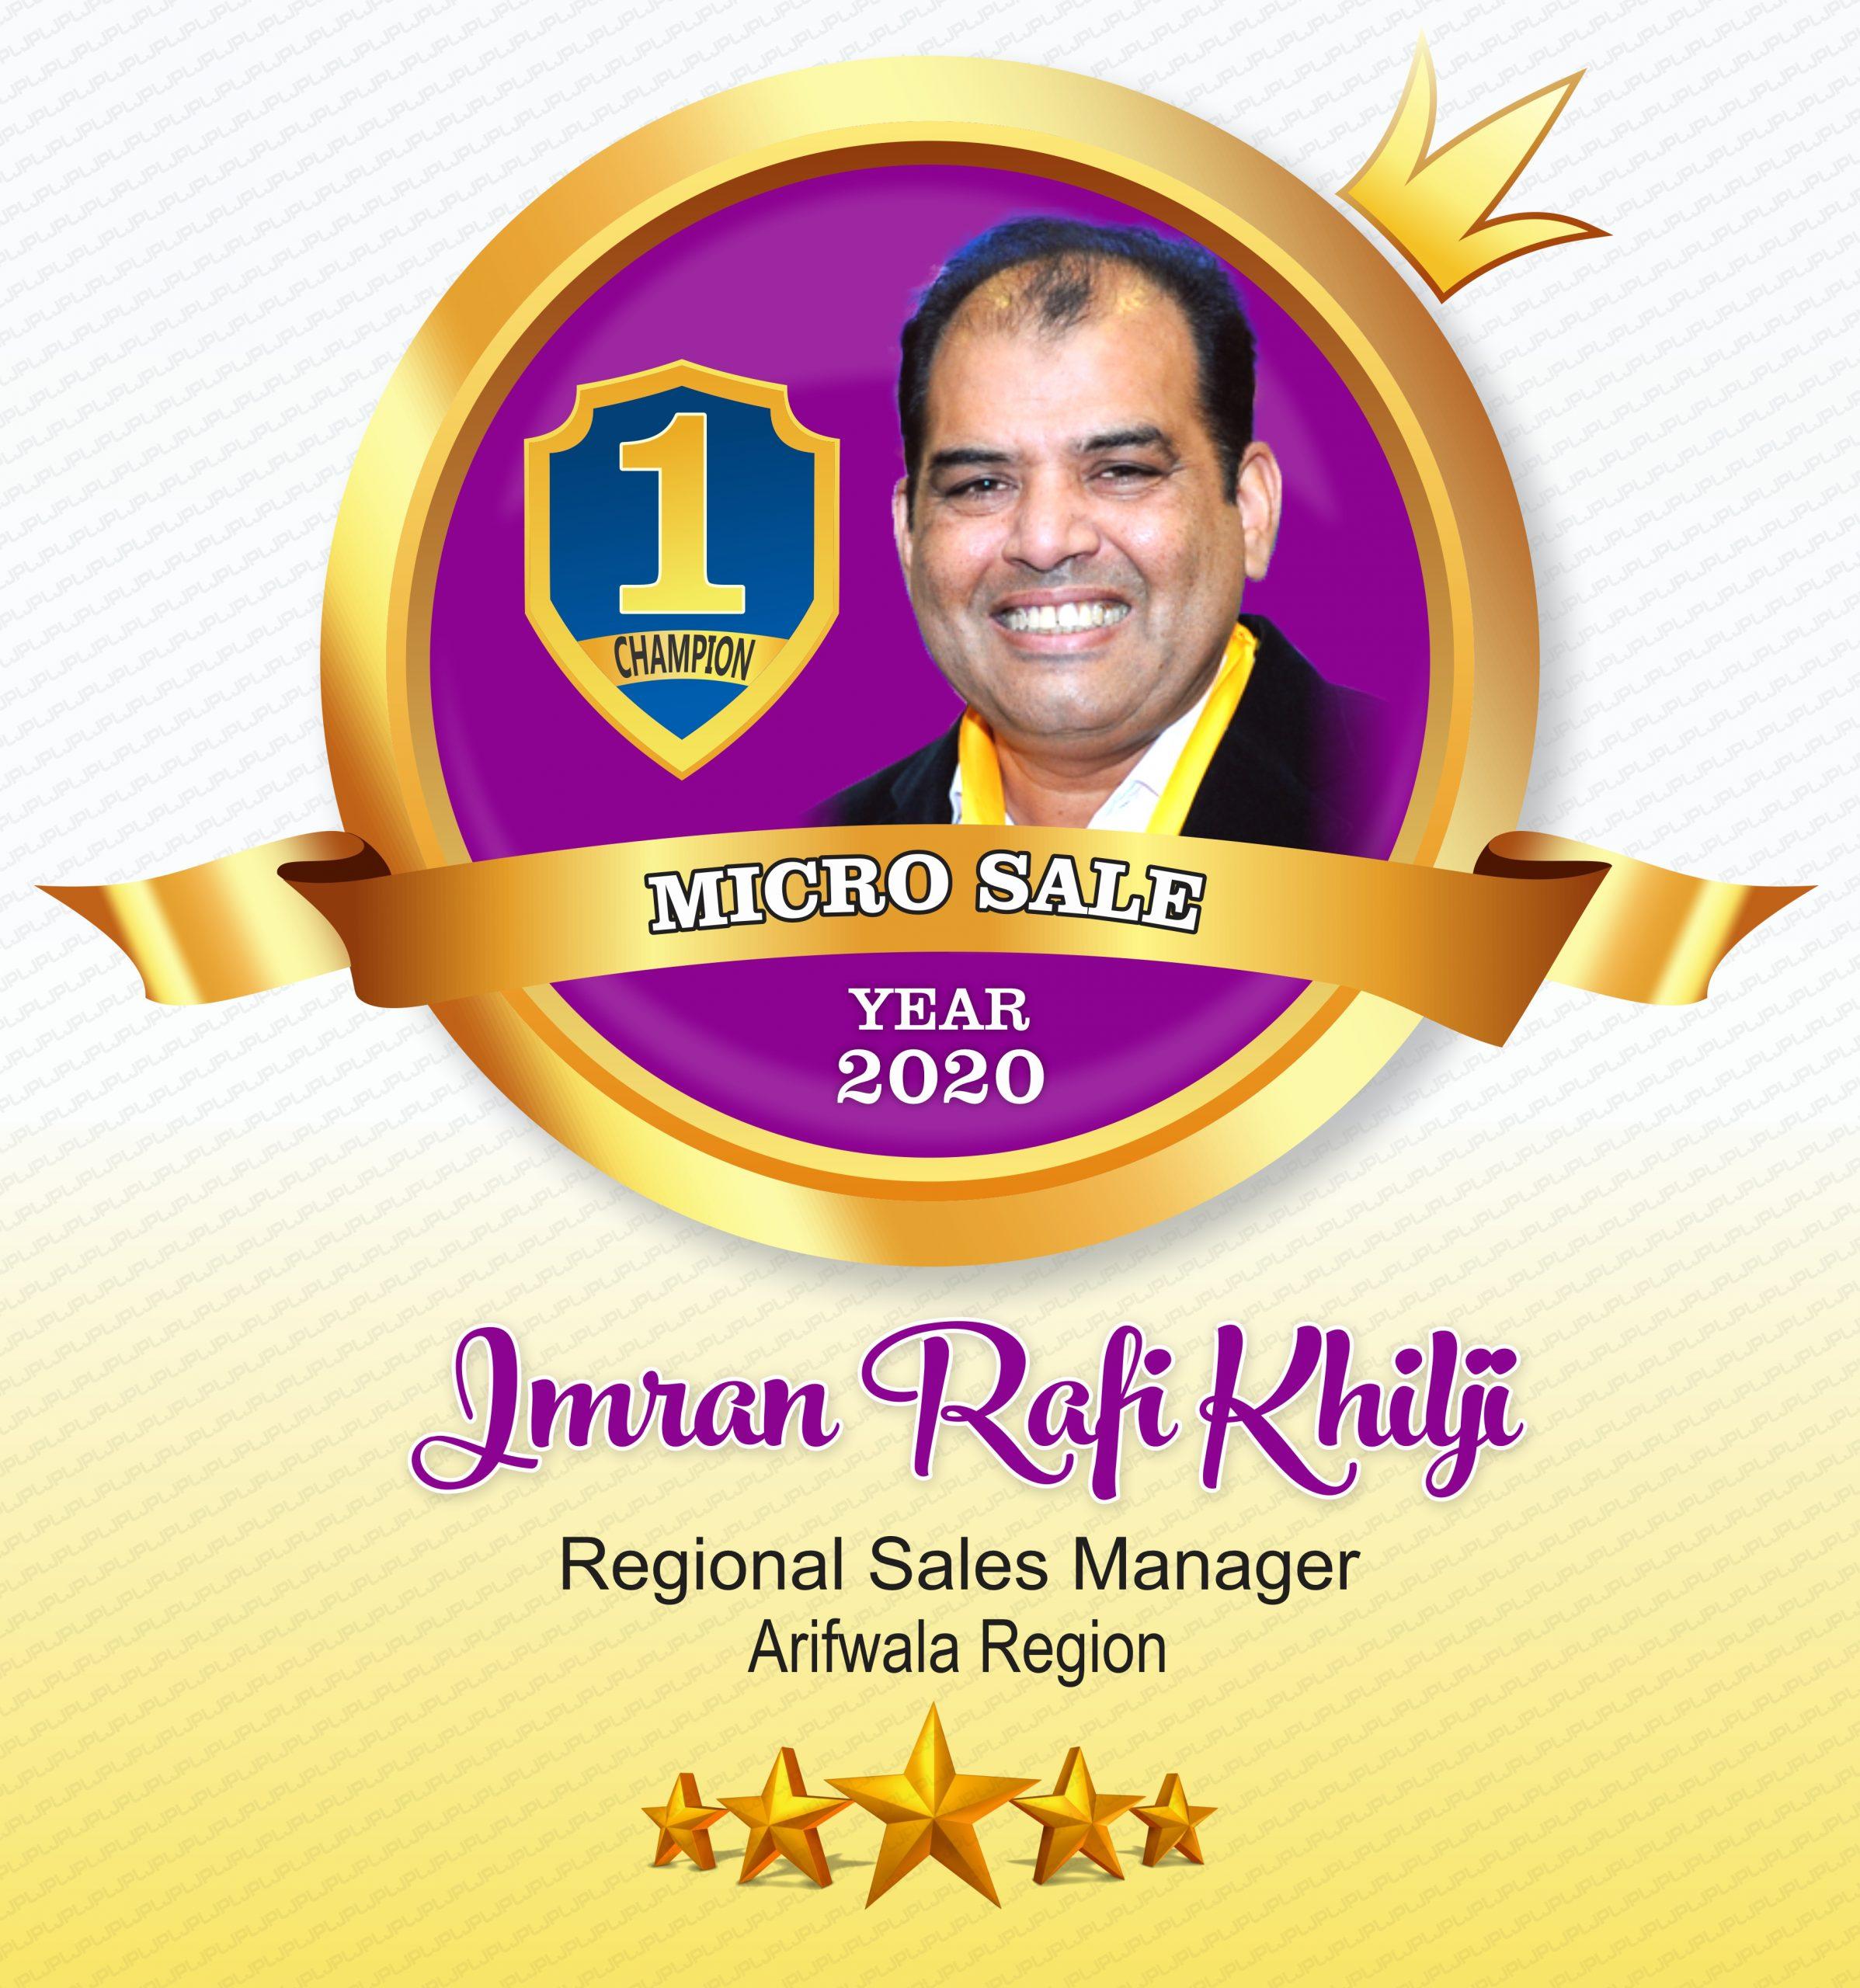 Imran Rafi Khilji